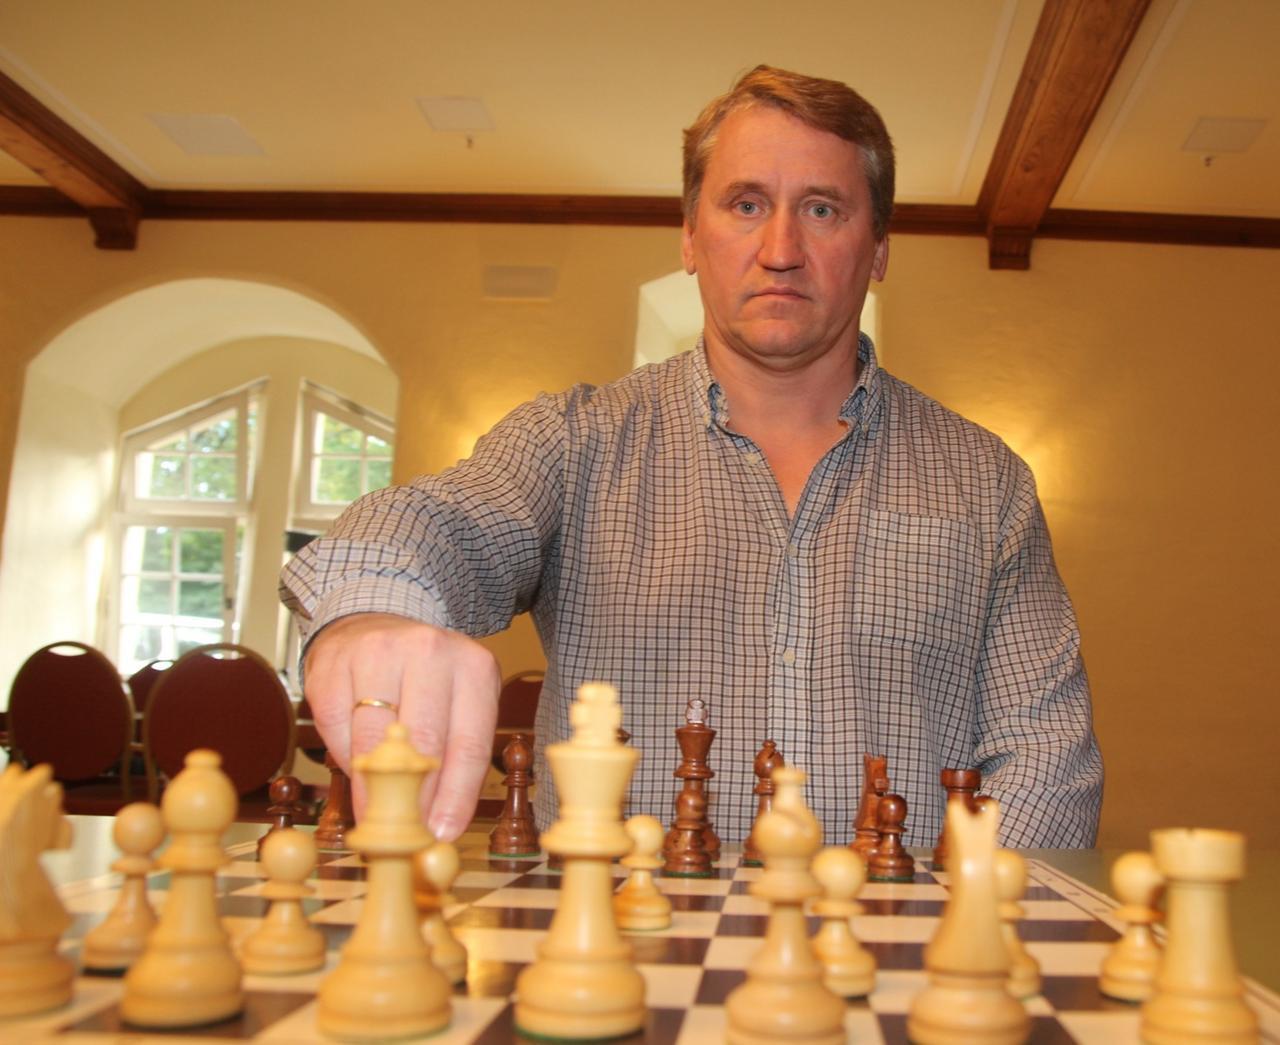 Oleg Korneev gewinnt das Turnier